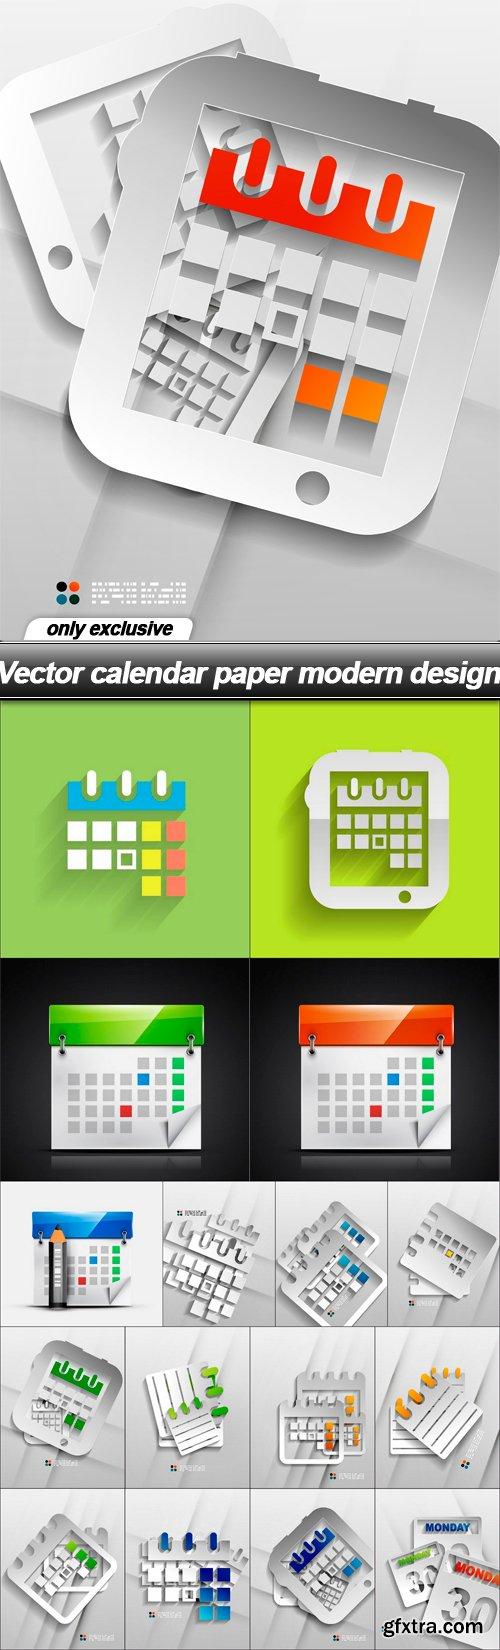 Vector calendar paper modern design - 17 EPS